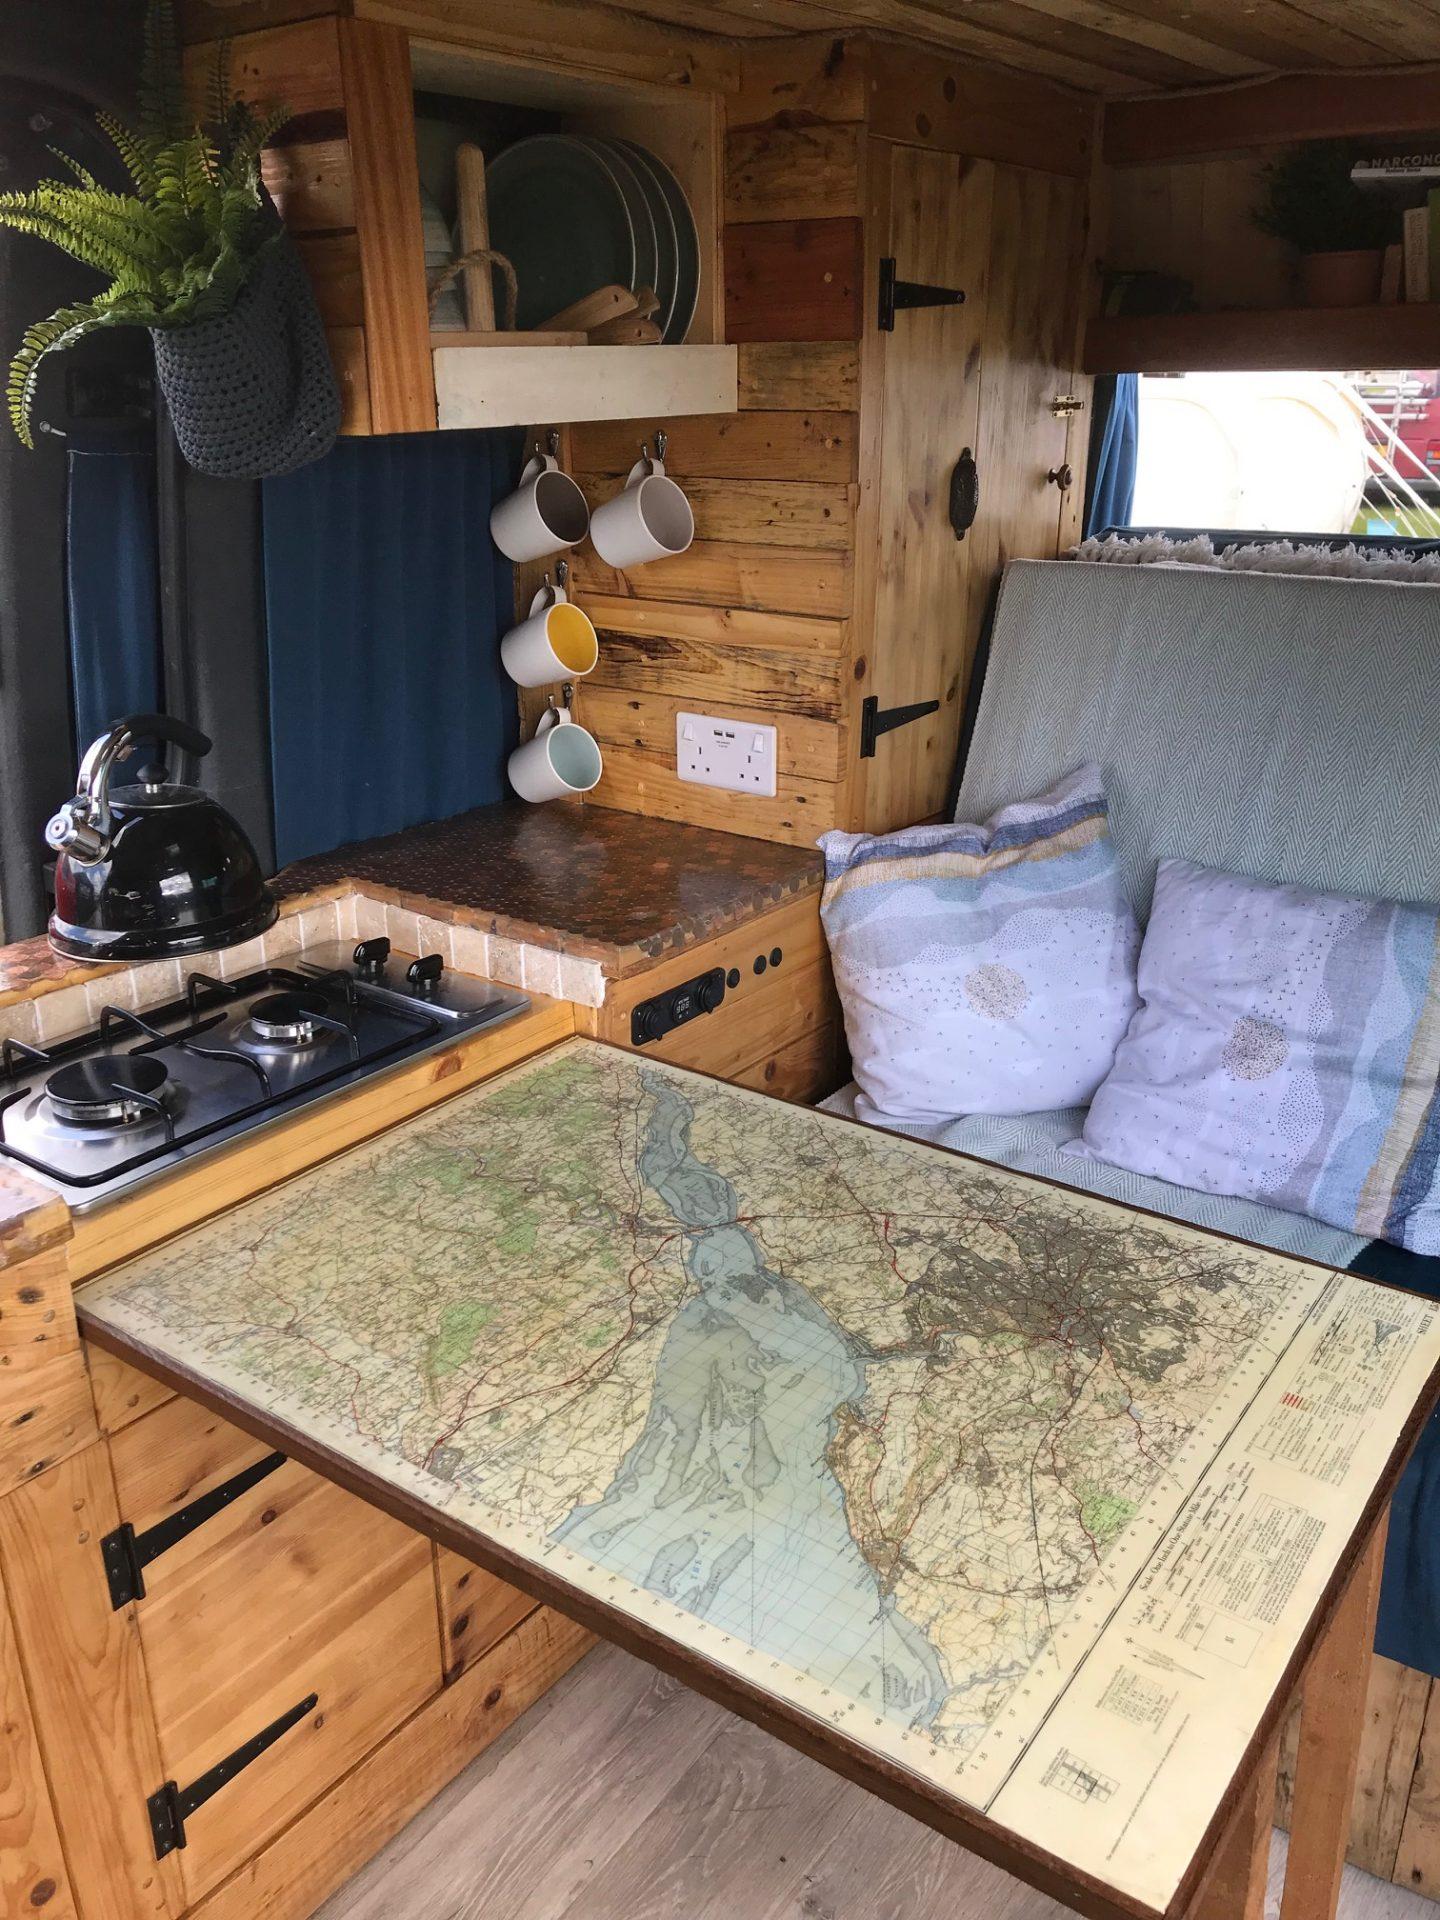 Quirky Camper Van Interior